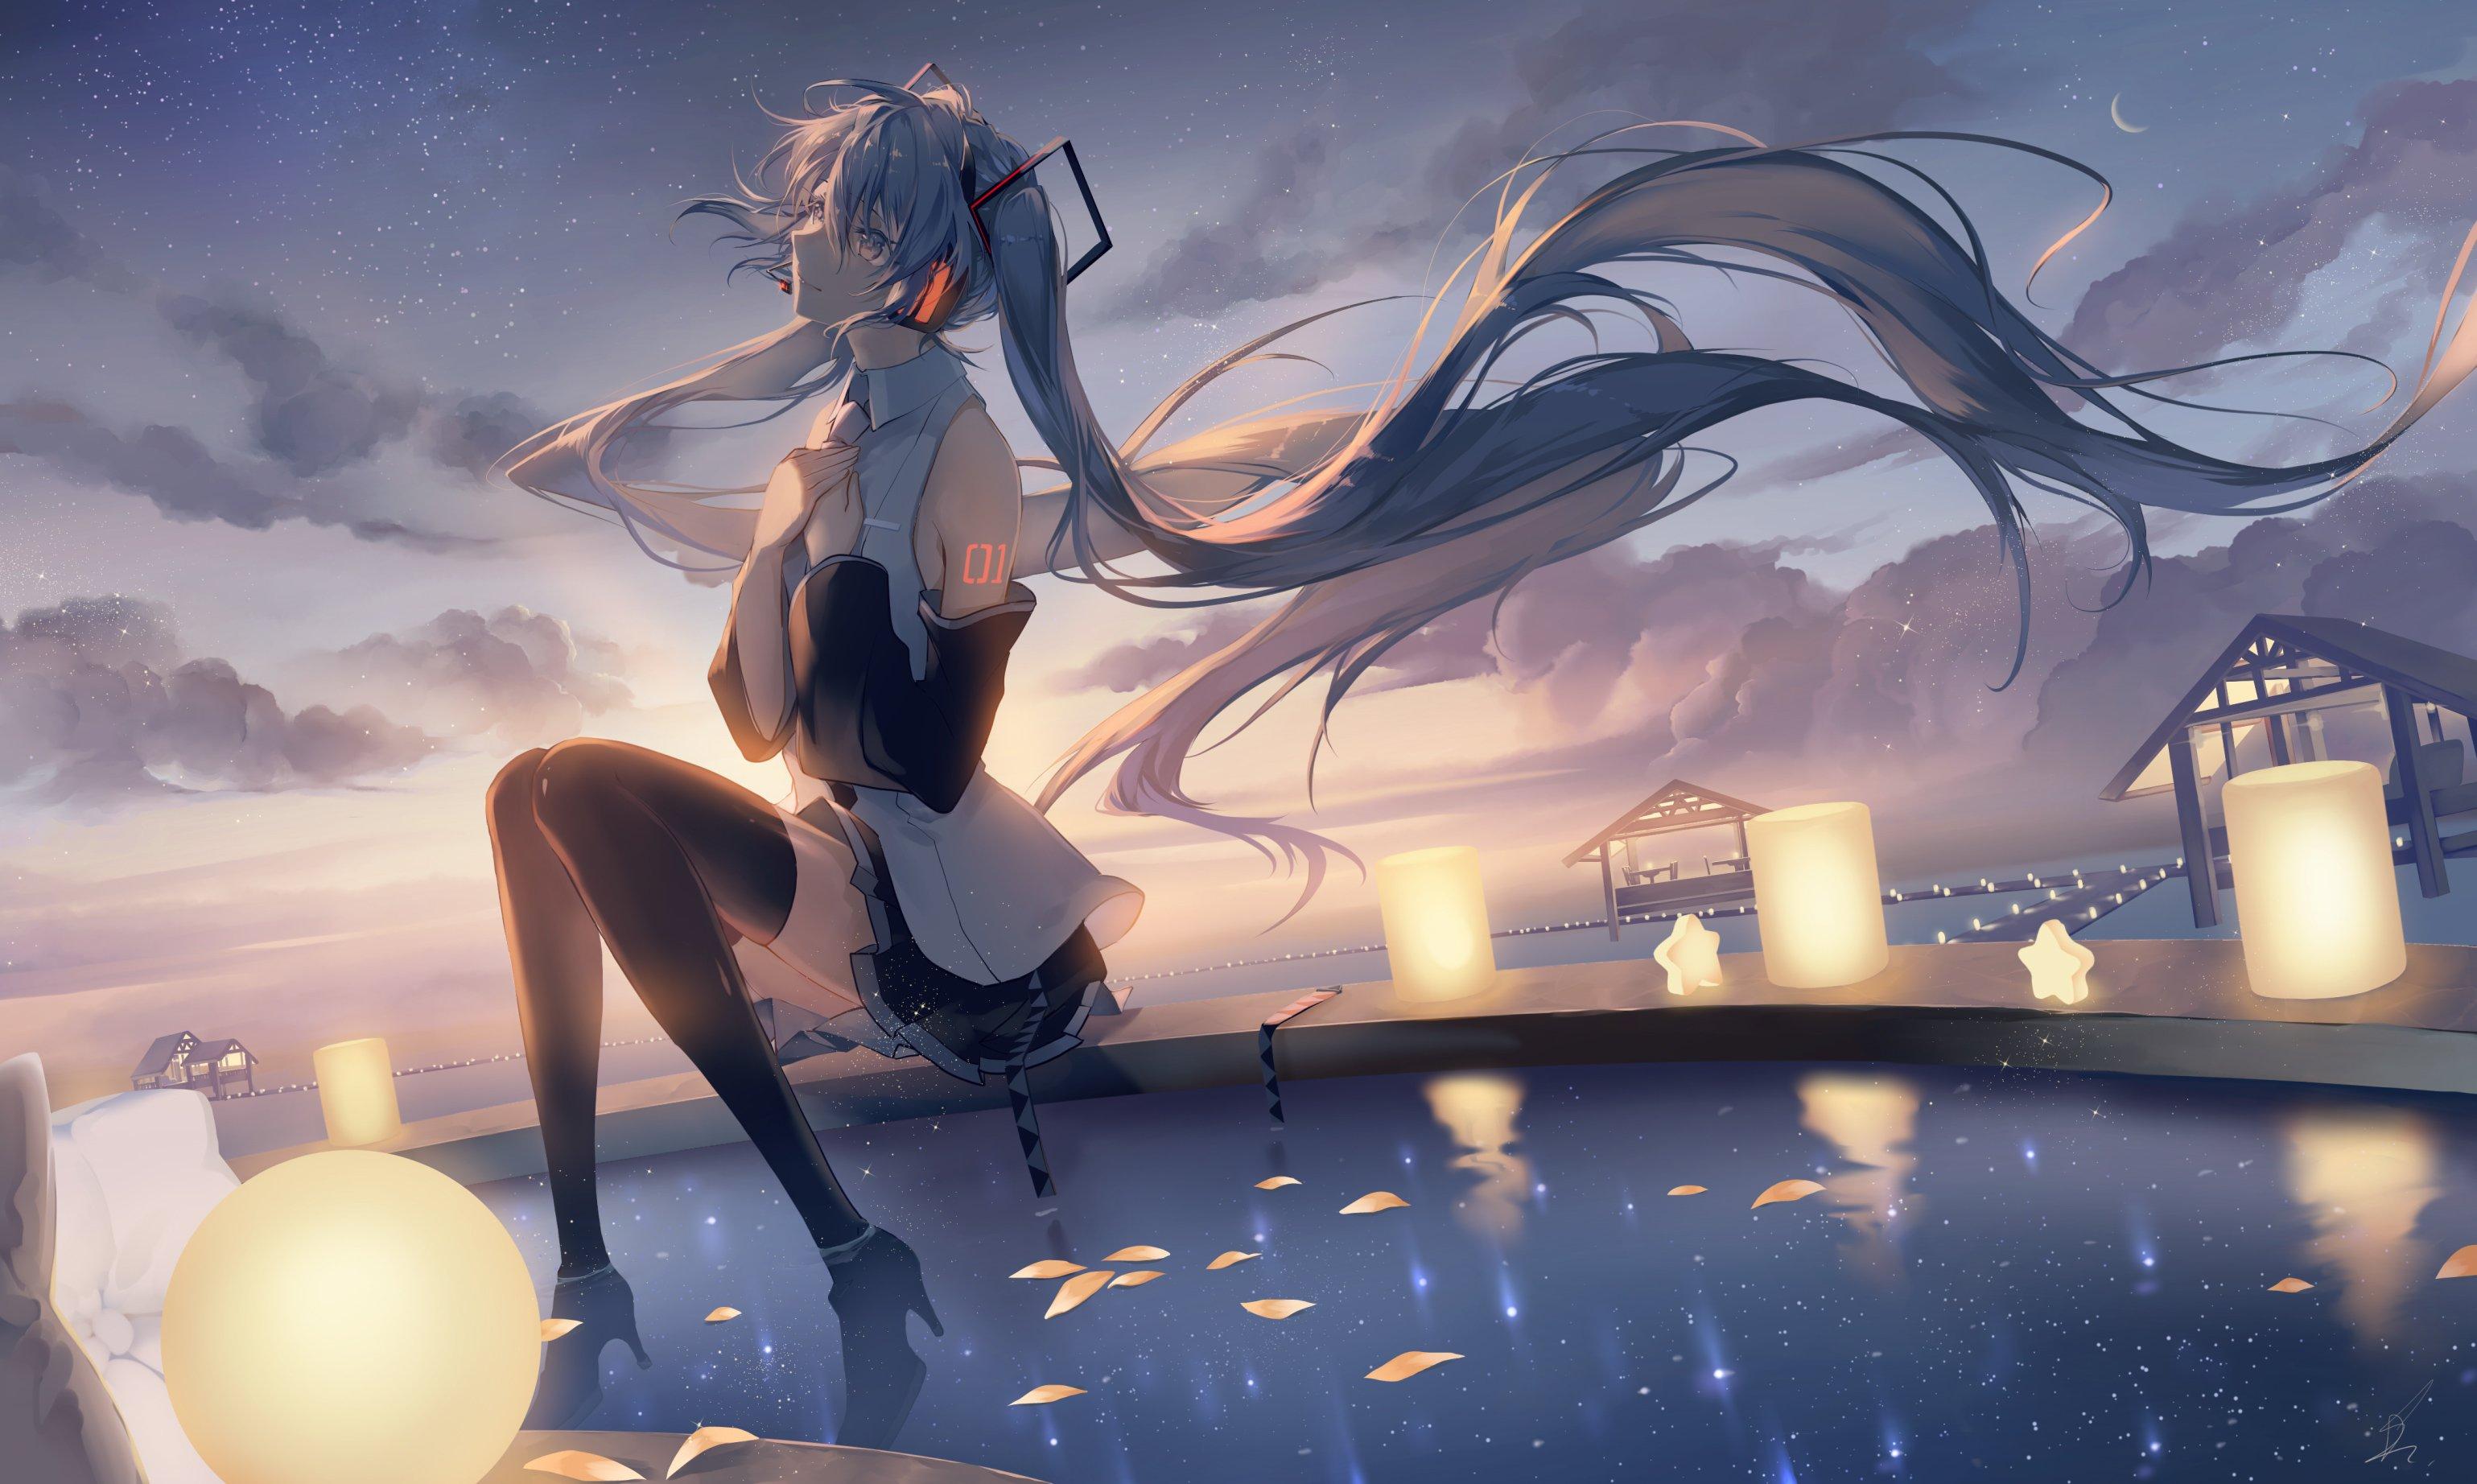 Fondos de pantalla Chica Anime Hatsune Miku escuchando musica